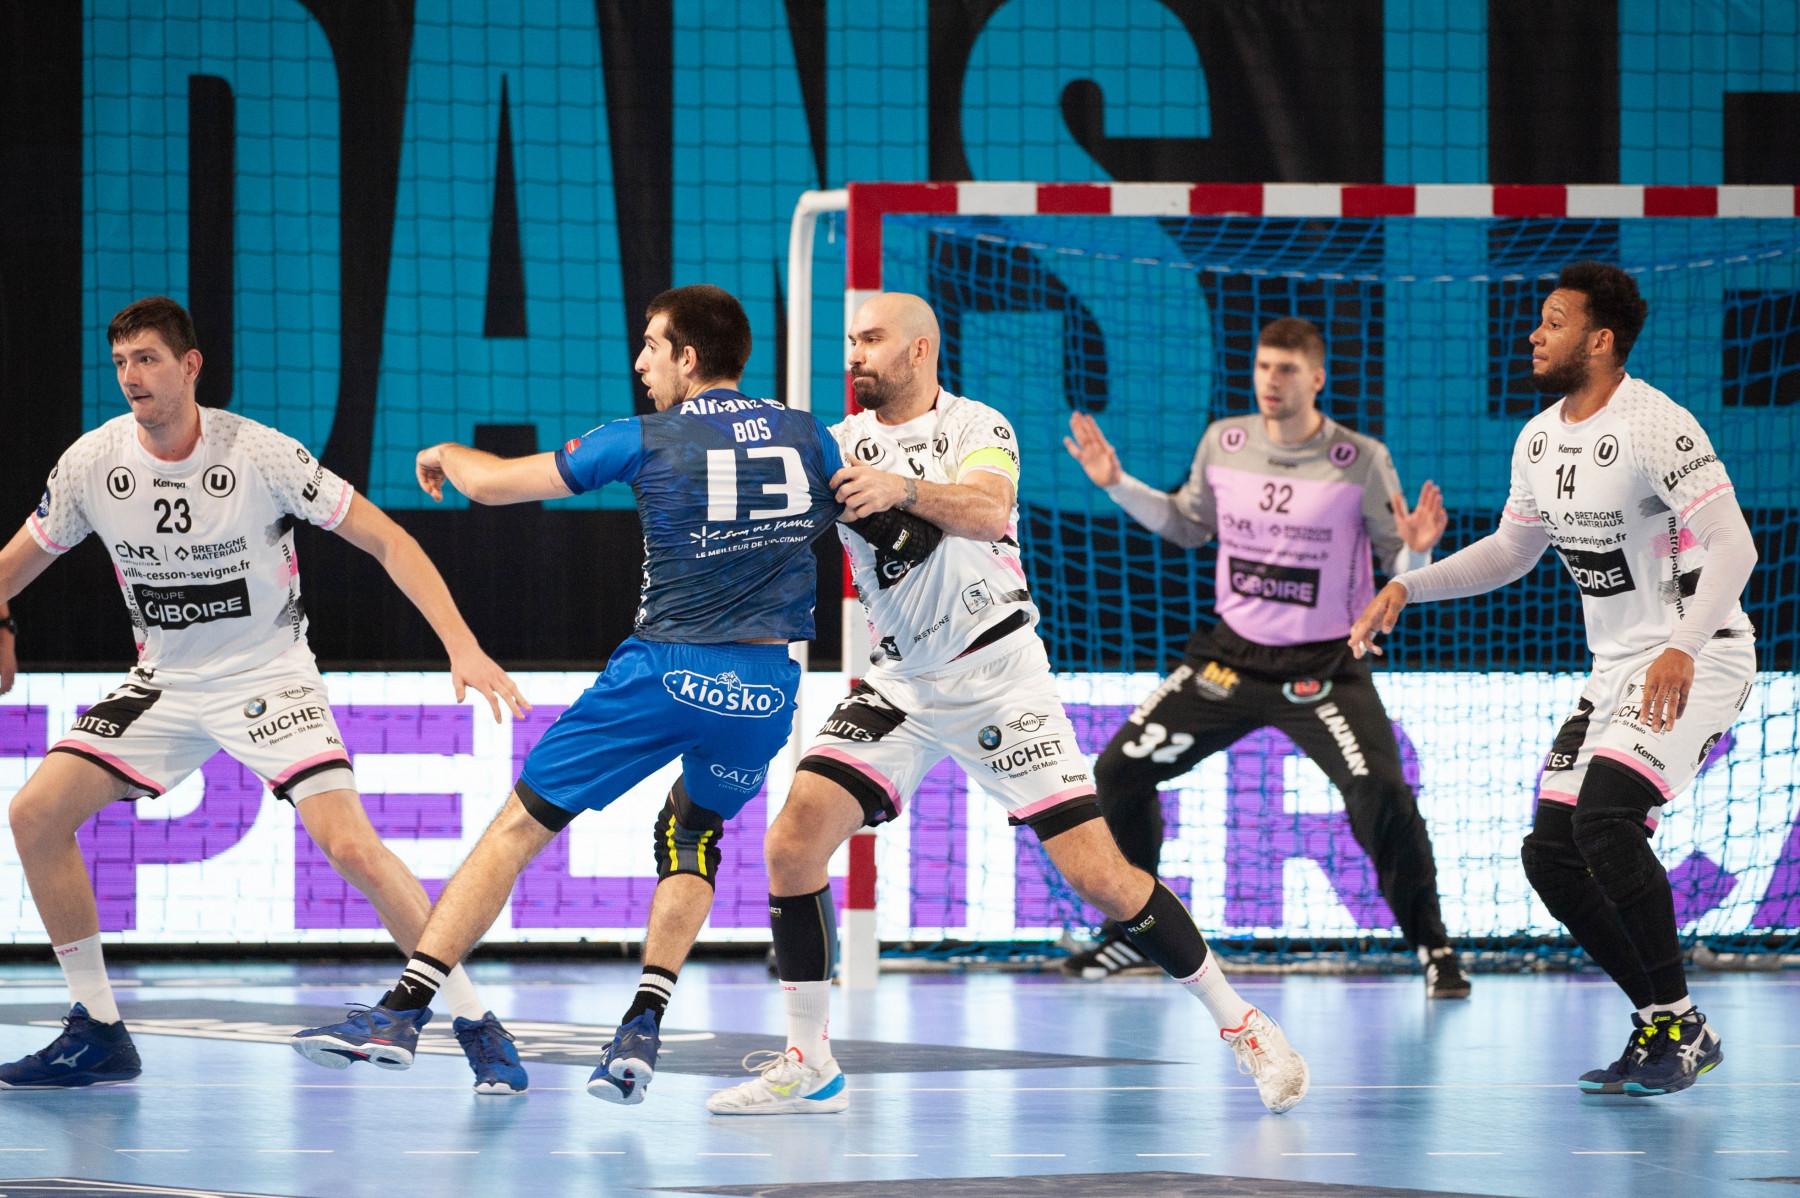 J8 : Montpellier - CRMHB : 28-28